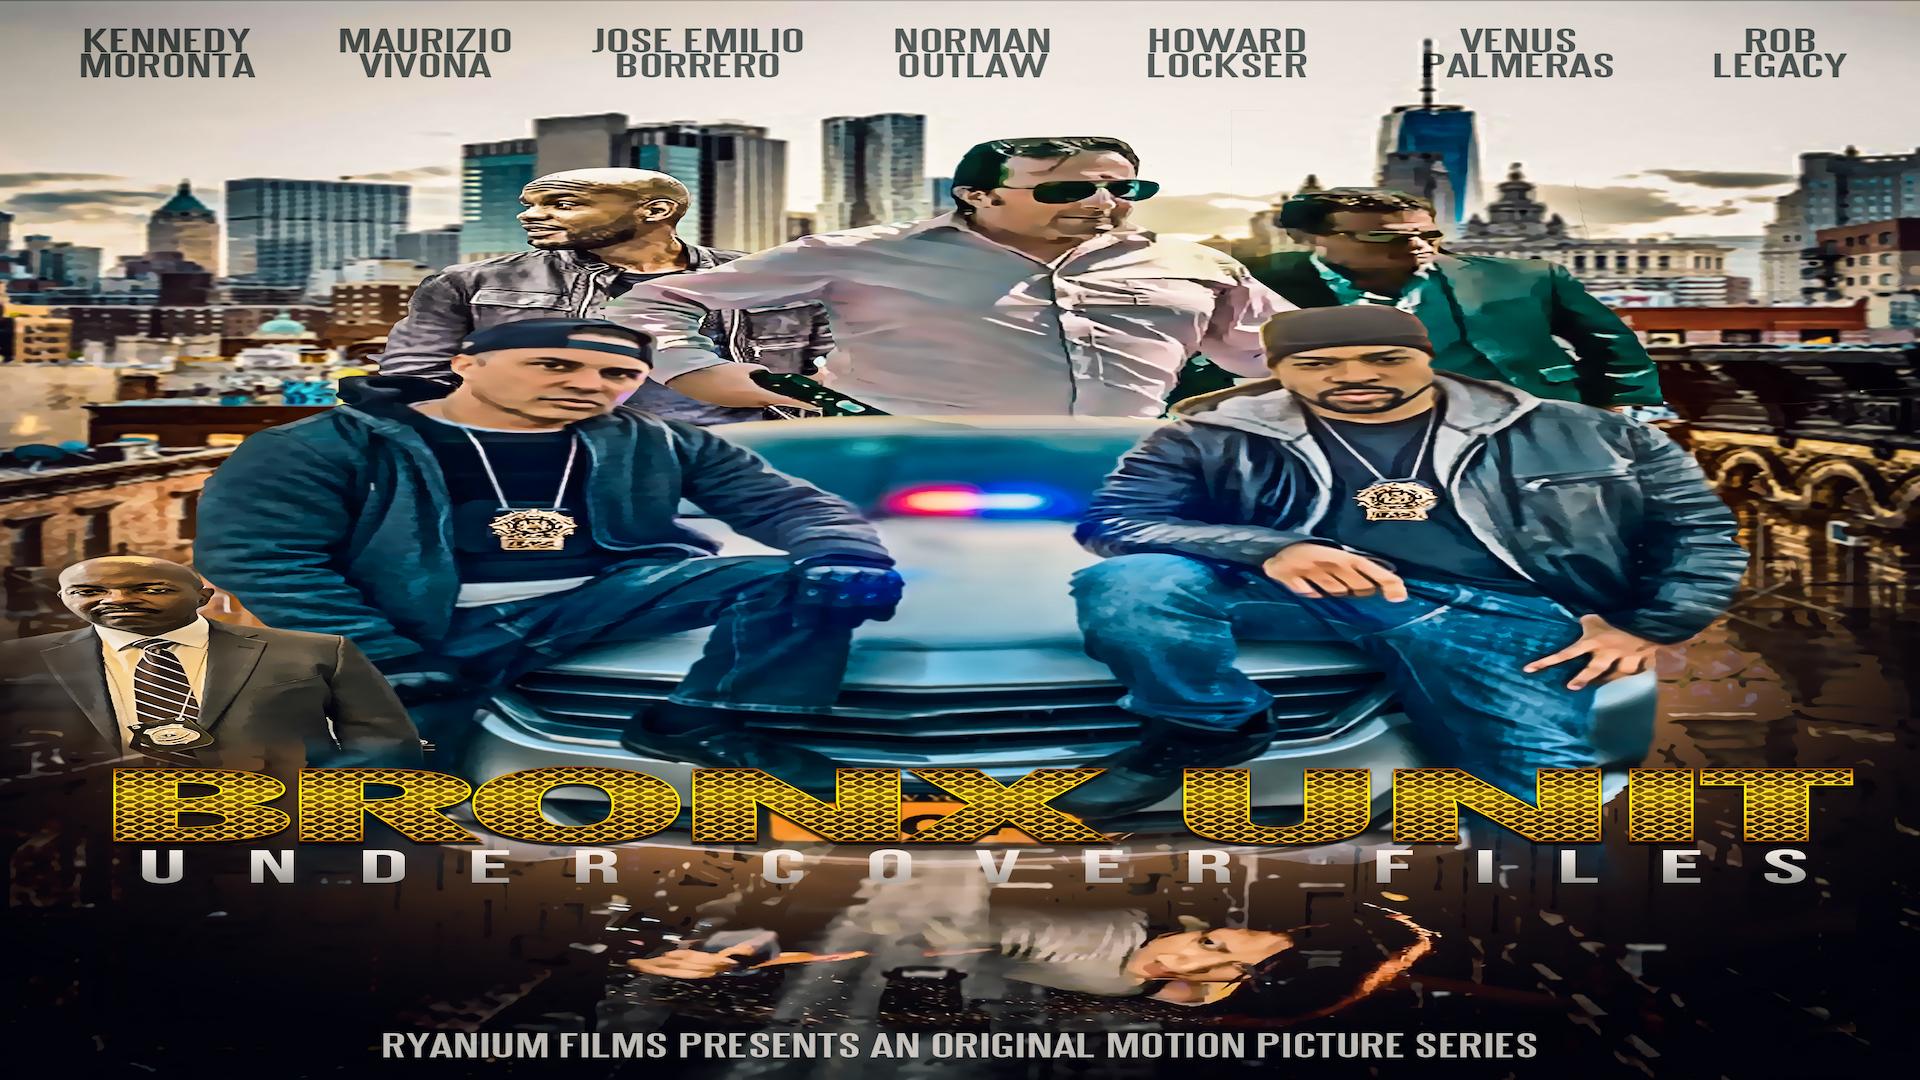 Bronx Unit Undercover Files - Season 1